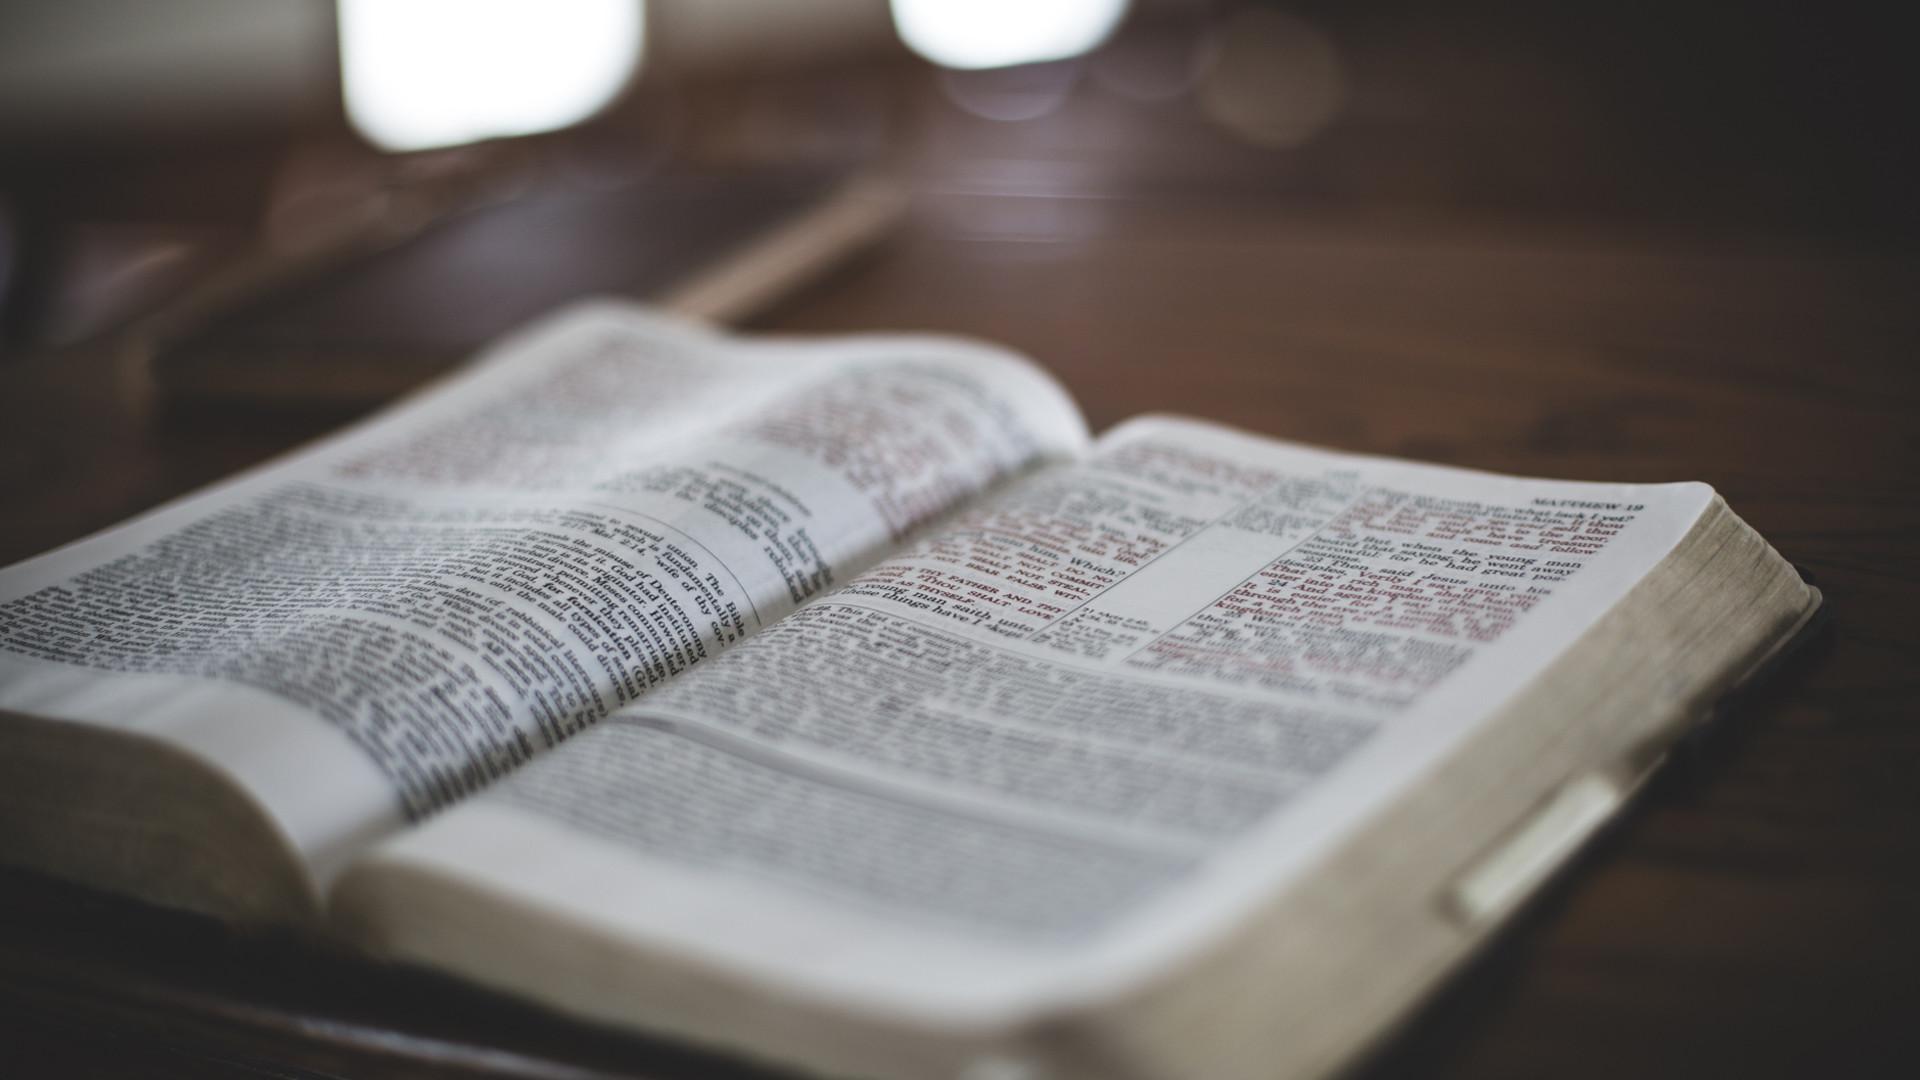 bible open key john church titus pastor children terms